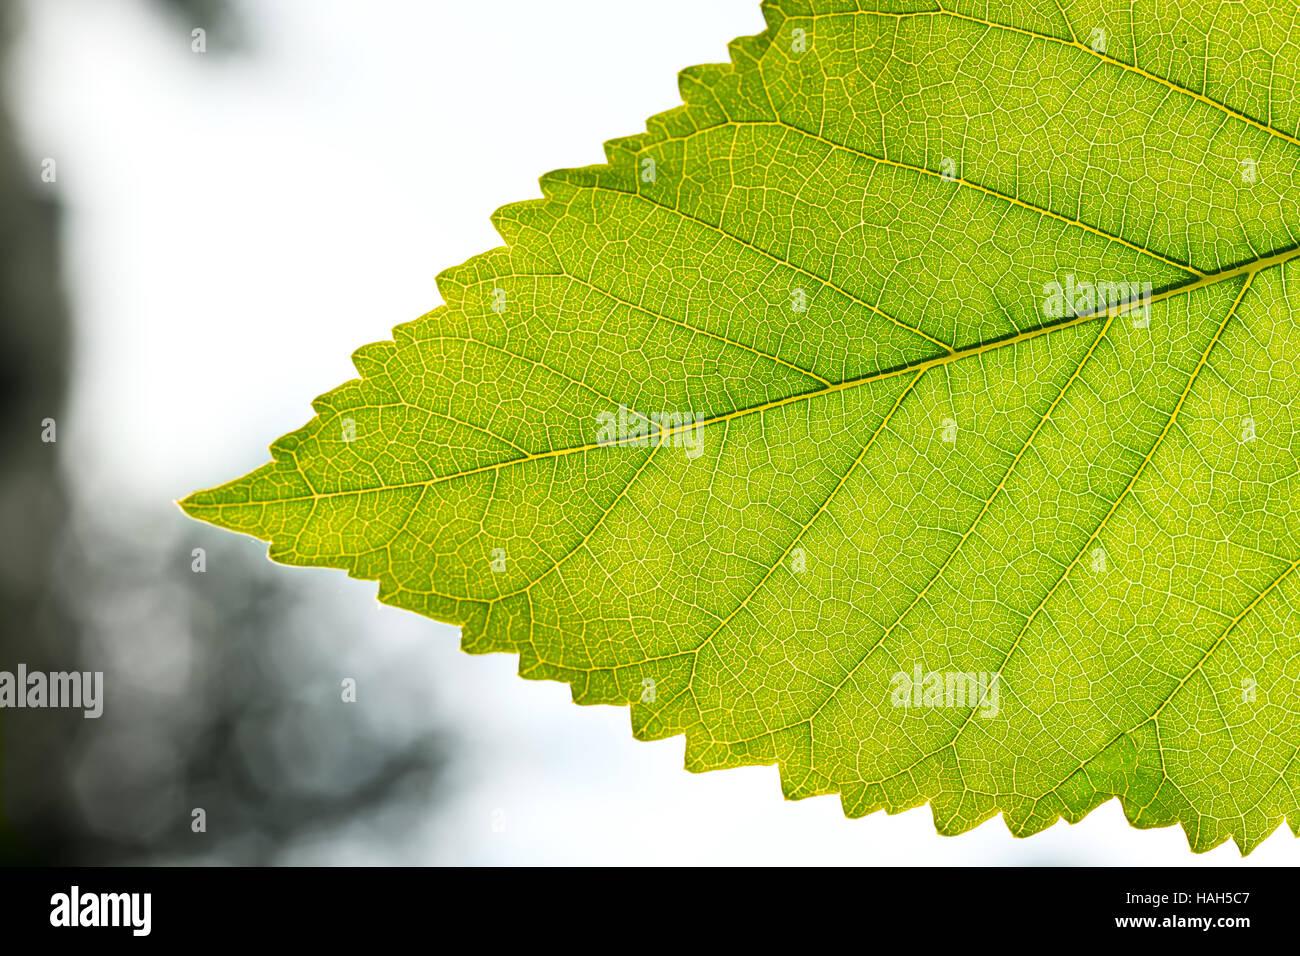 Fragment a green leaf, backlit on a blurred background close-up. - Stock Image